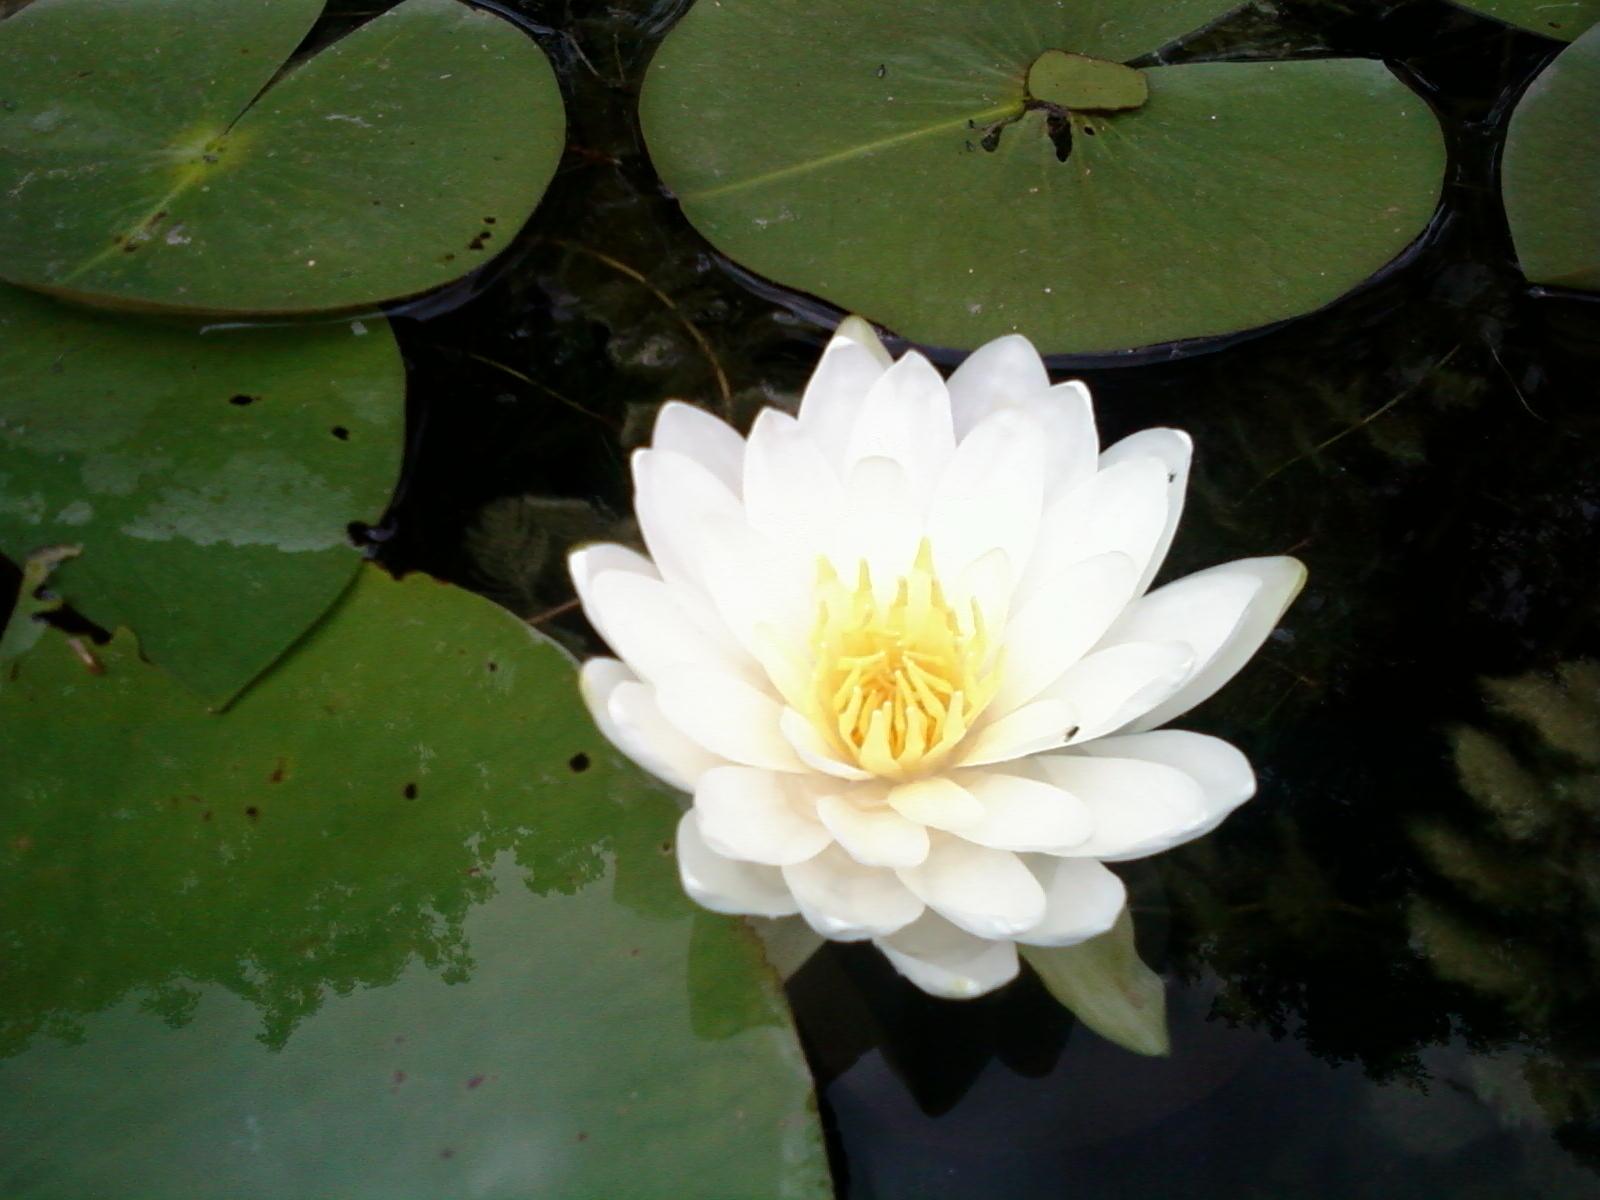 Filewhite water lillyg wikipedia filewhite water lillyg mightylinksfo